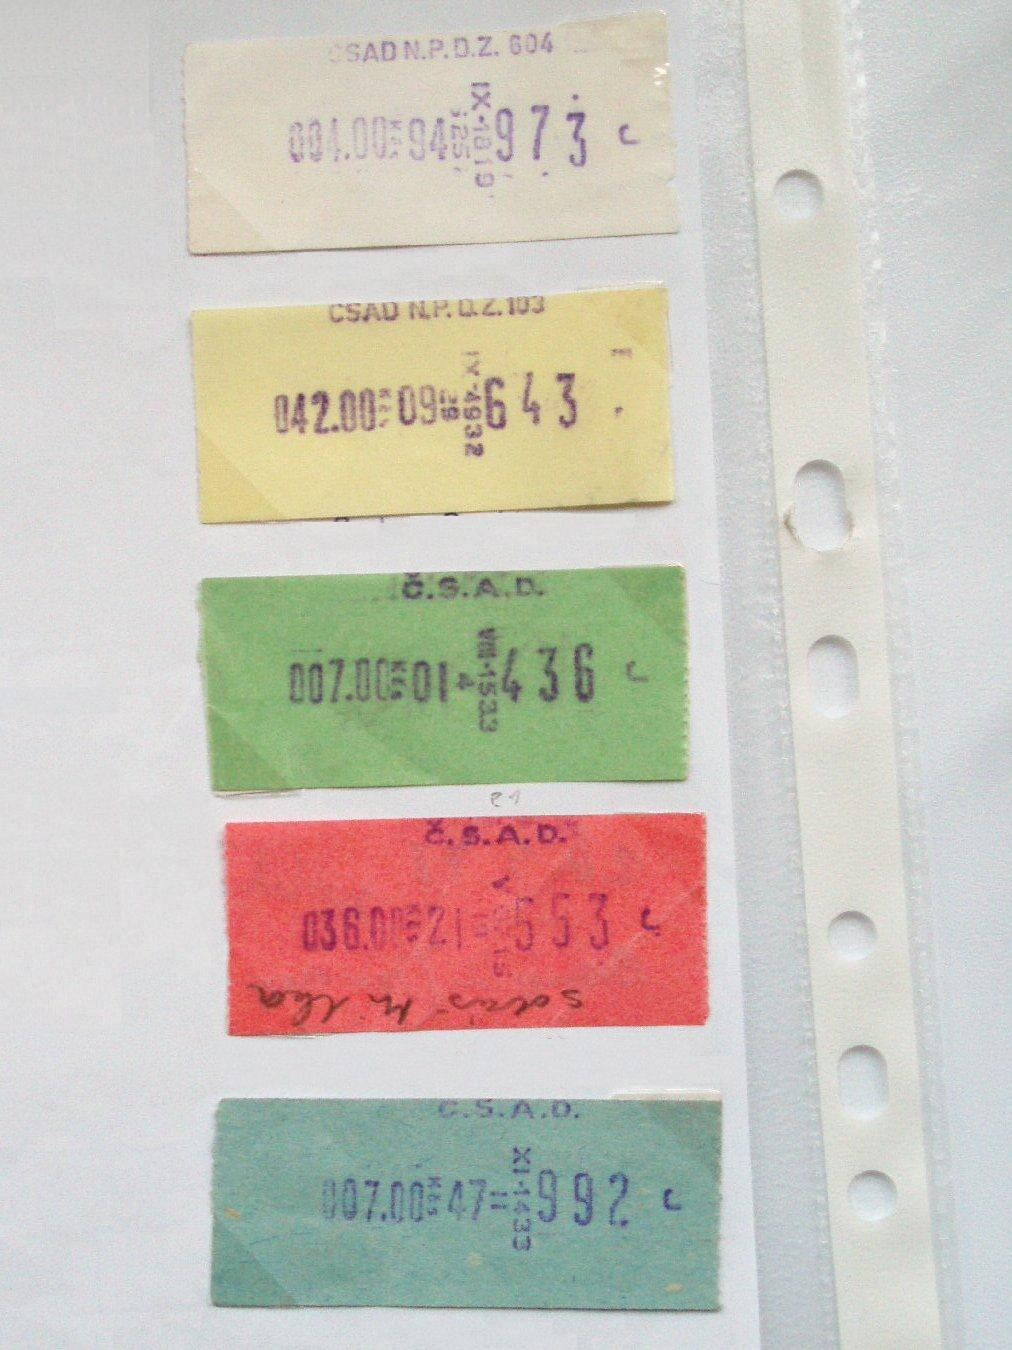 CSAD tickets